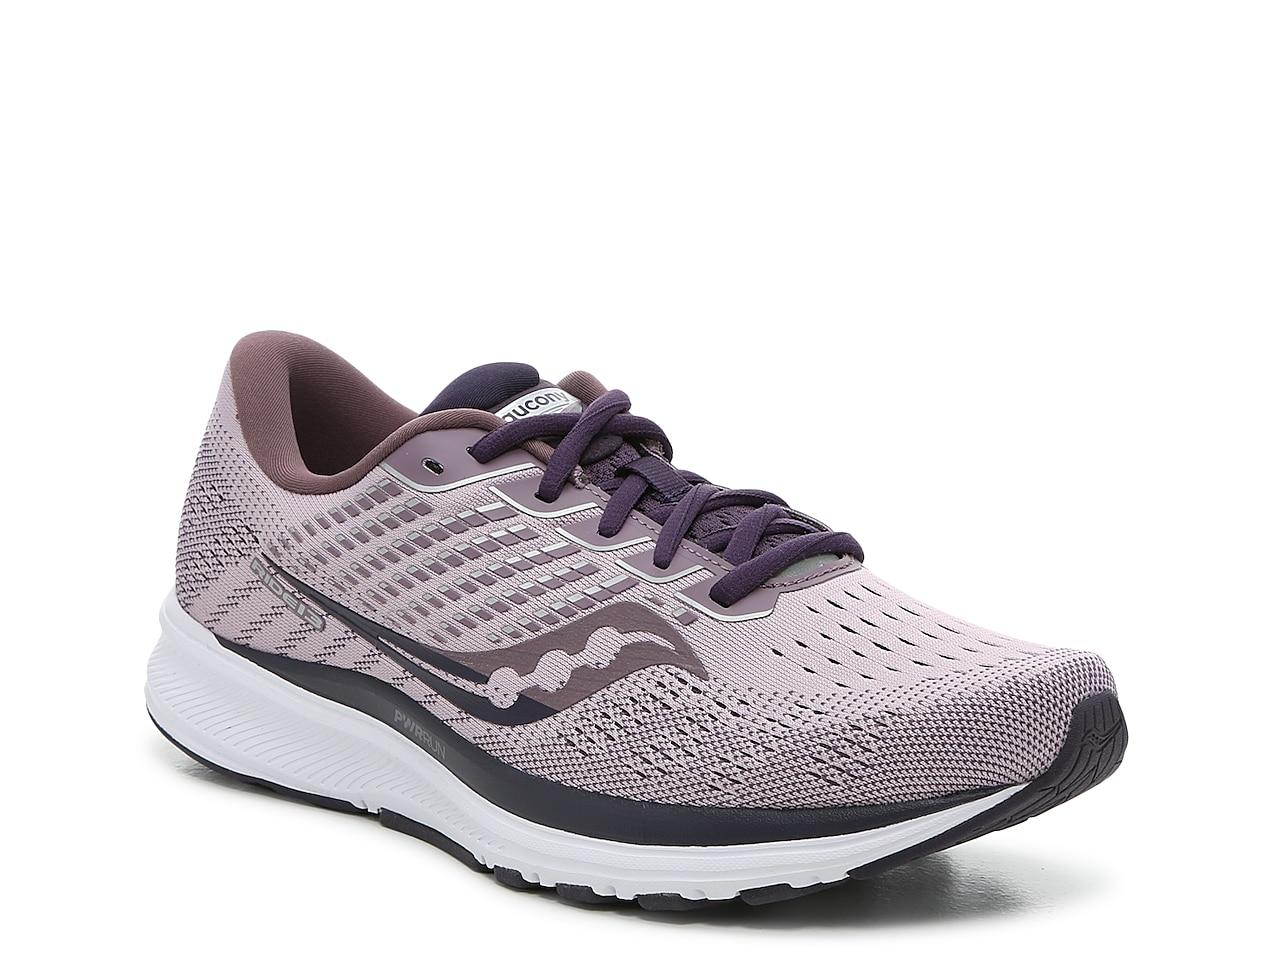 Ride 13 Running Shoe - Women's